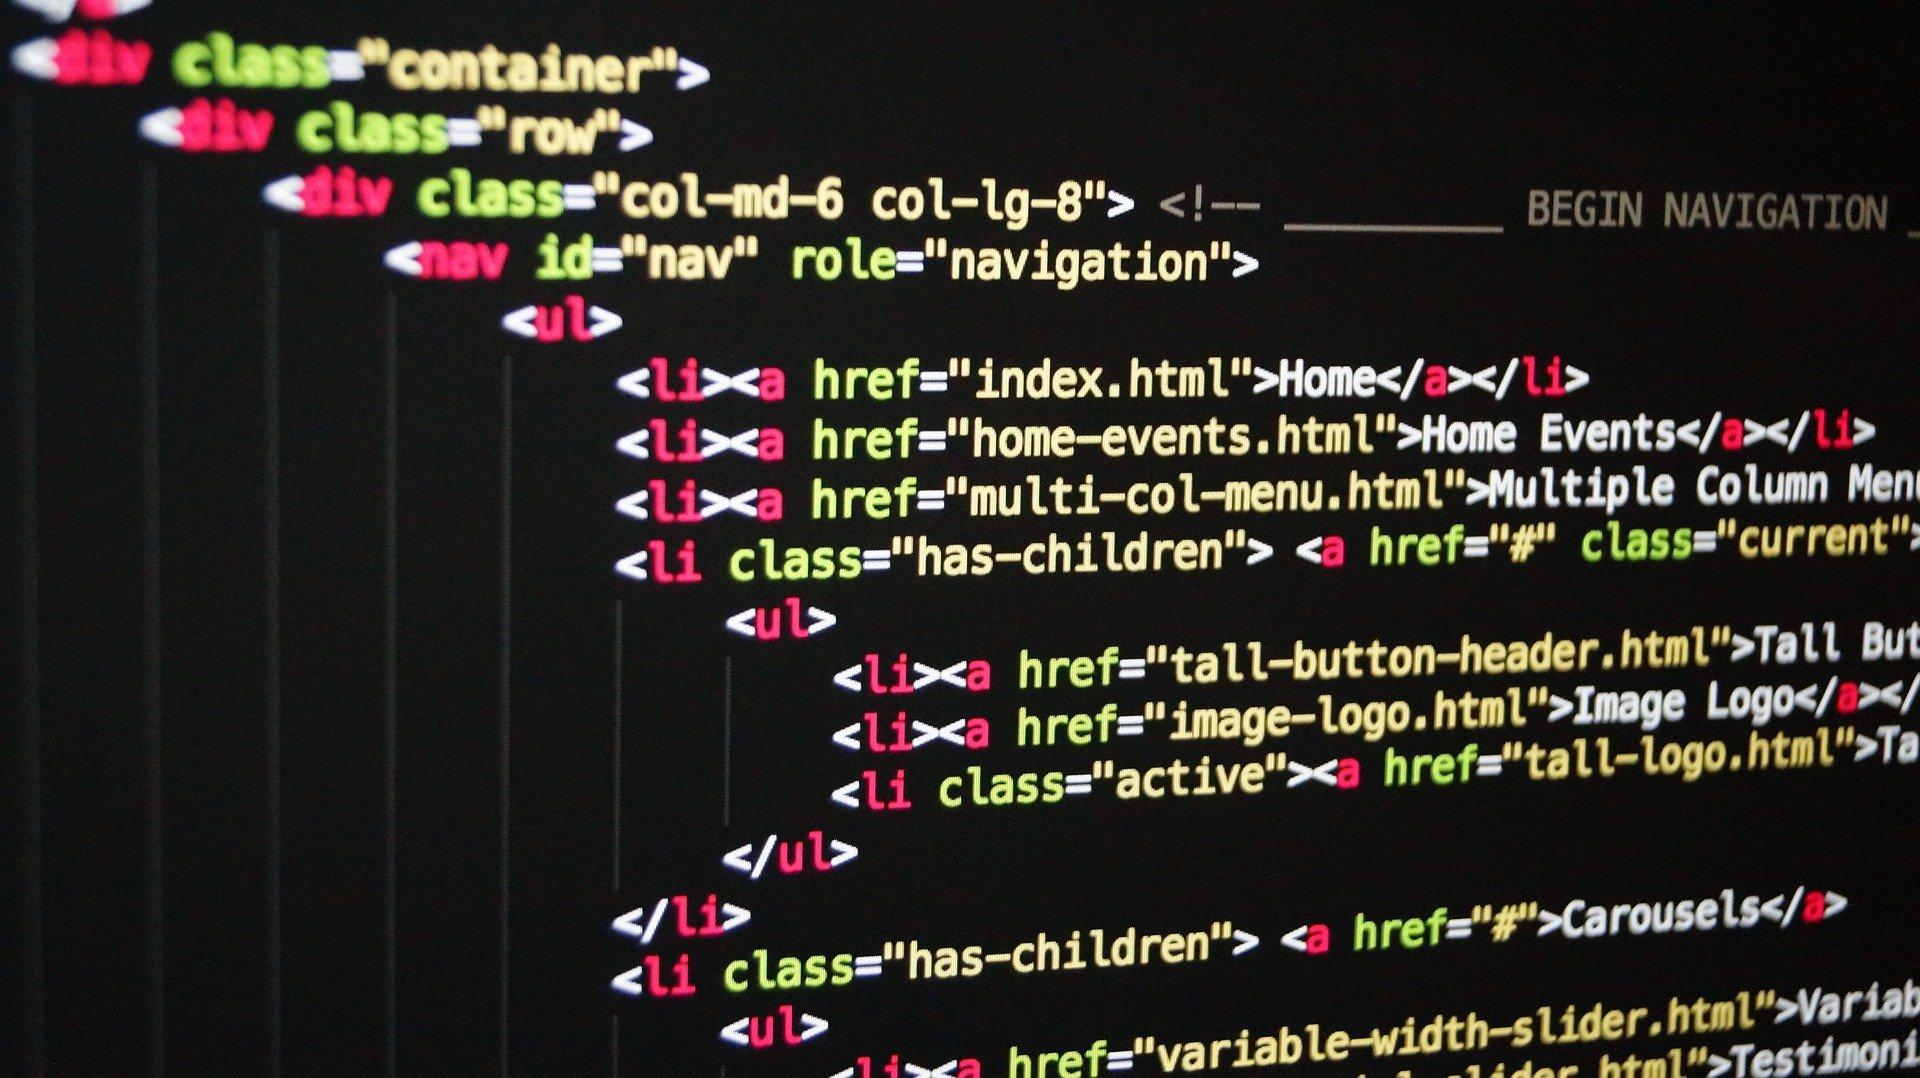 Sviluppo software | Sintesi